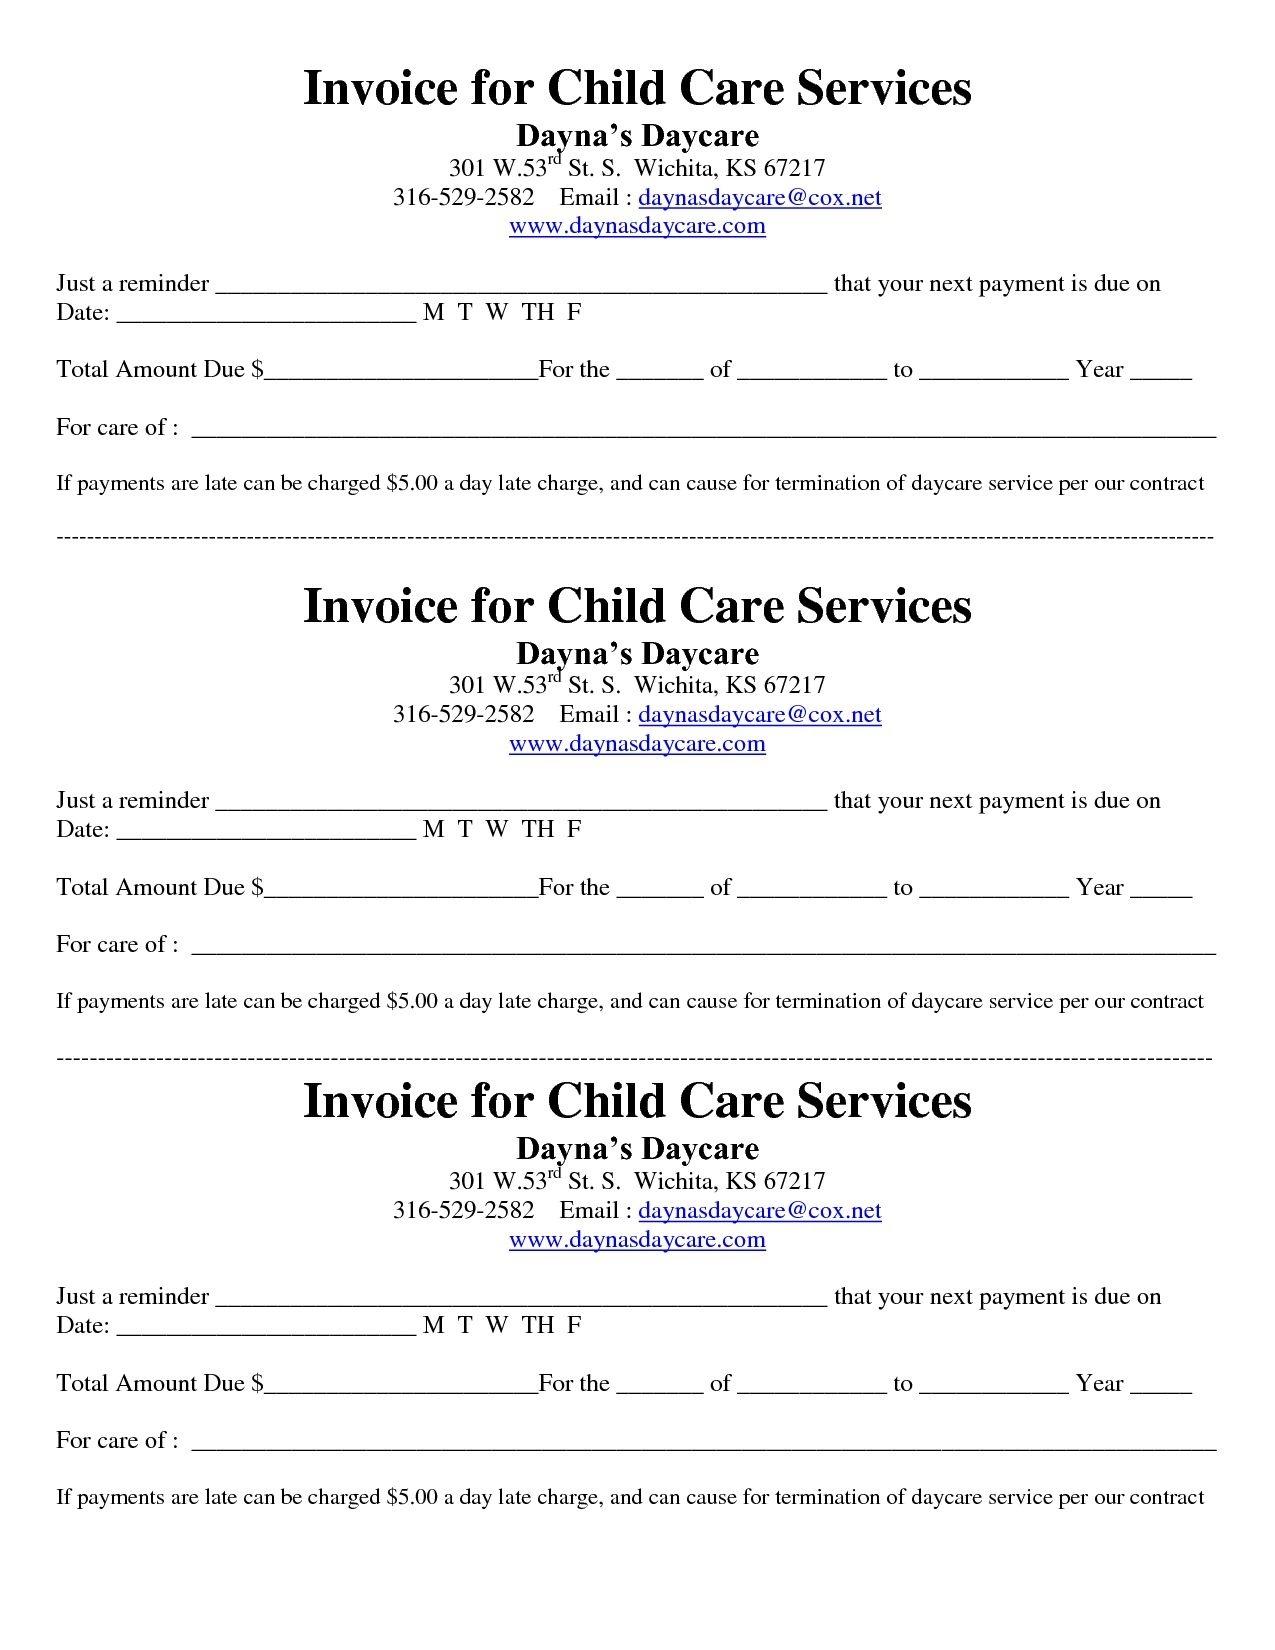 Child Care Receipt/invoice | Jordi Preschool | Invoice Template - Free Printable Daycare Receipts